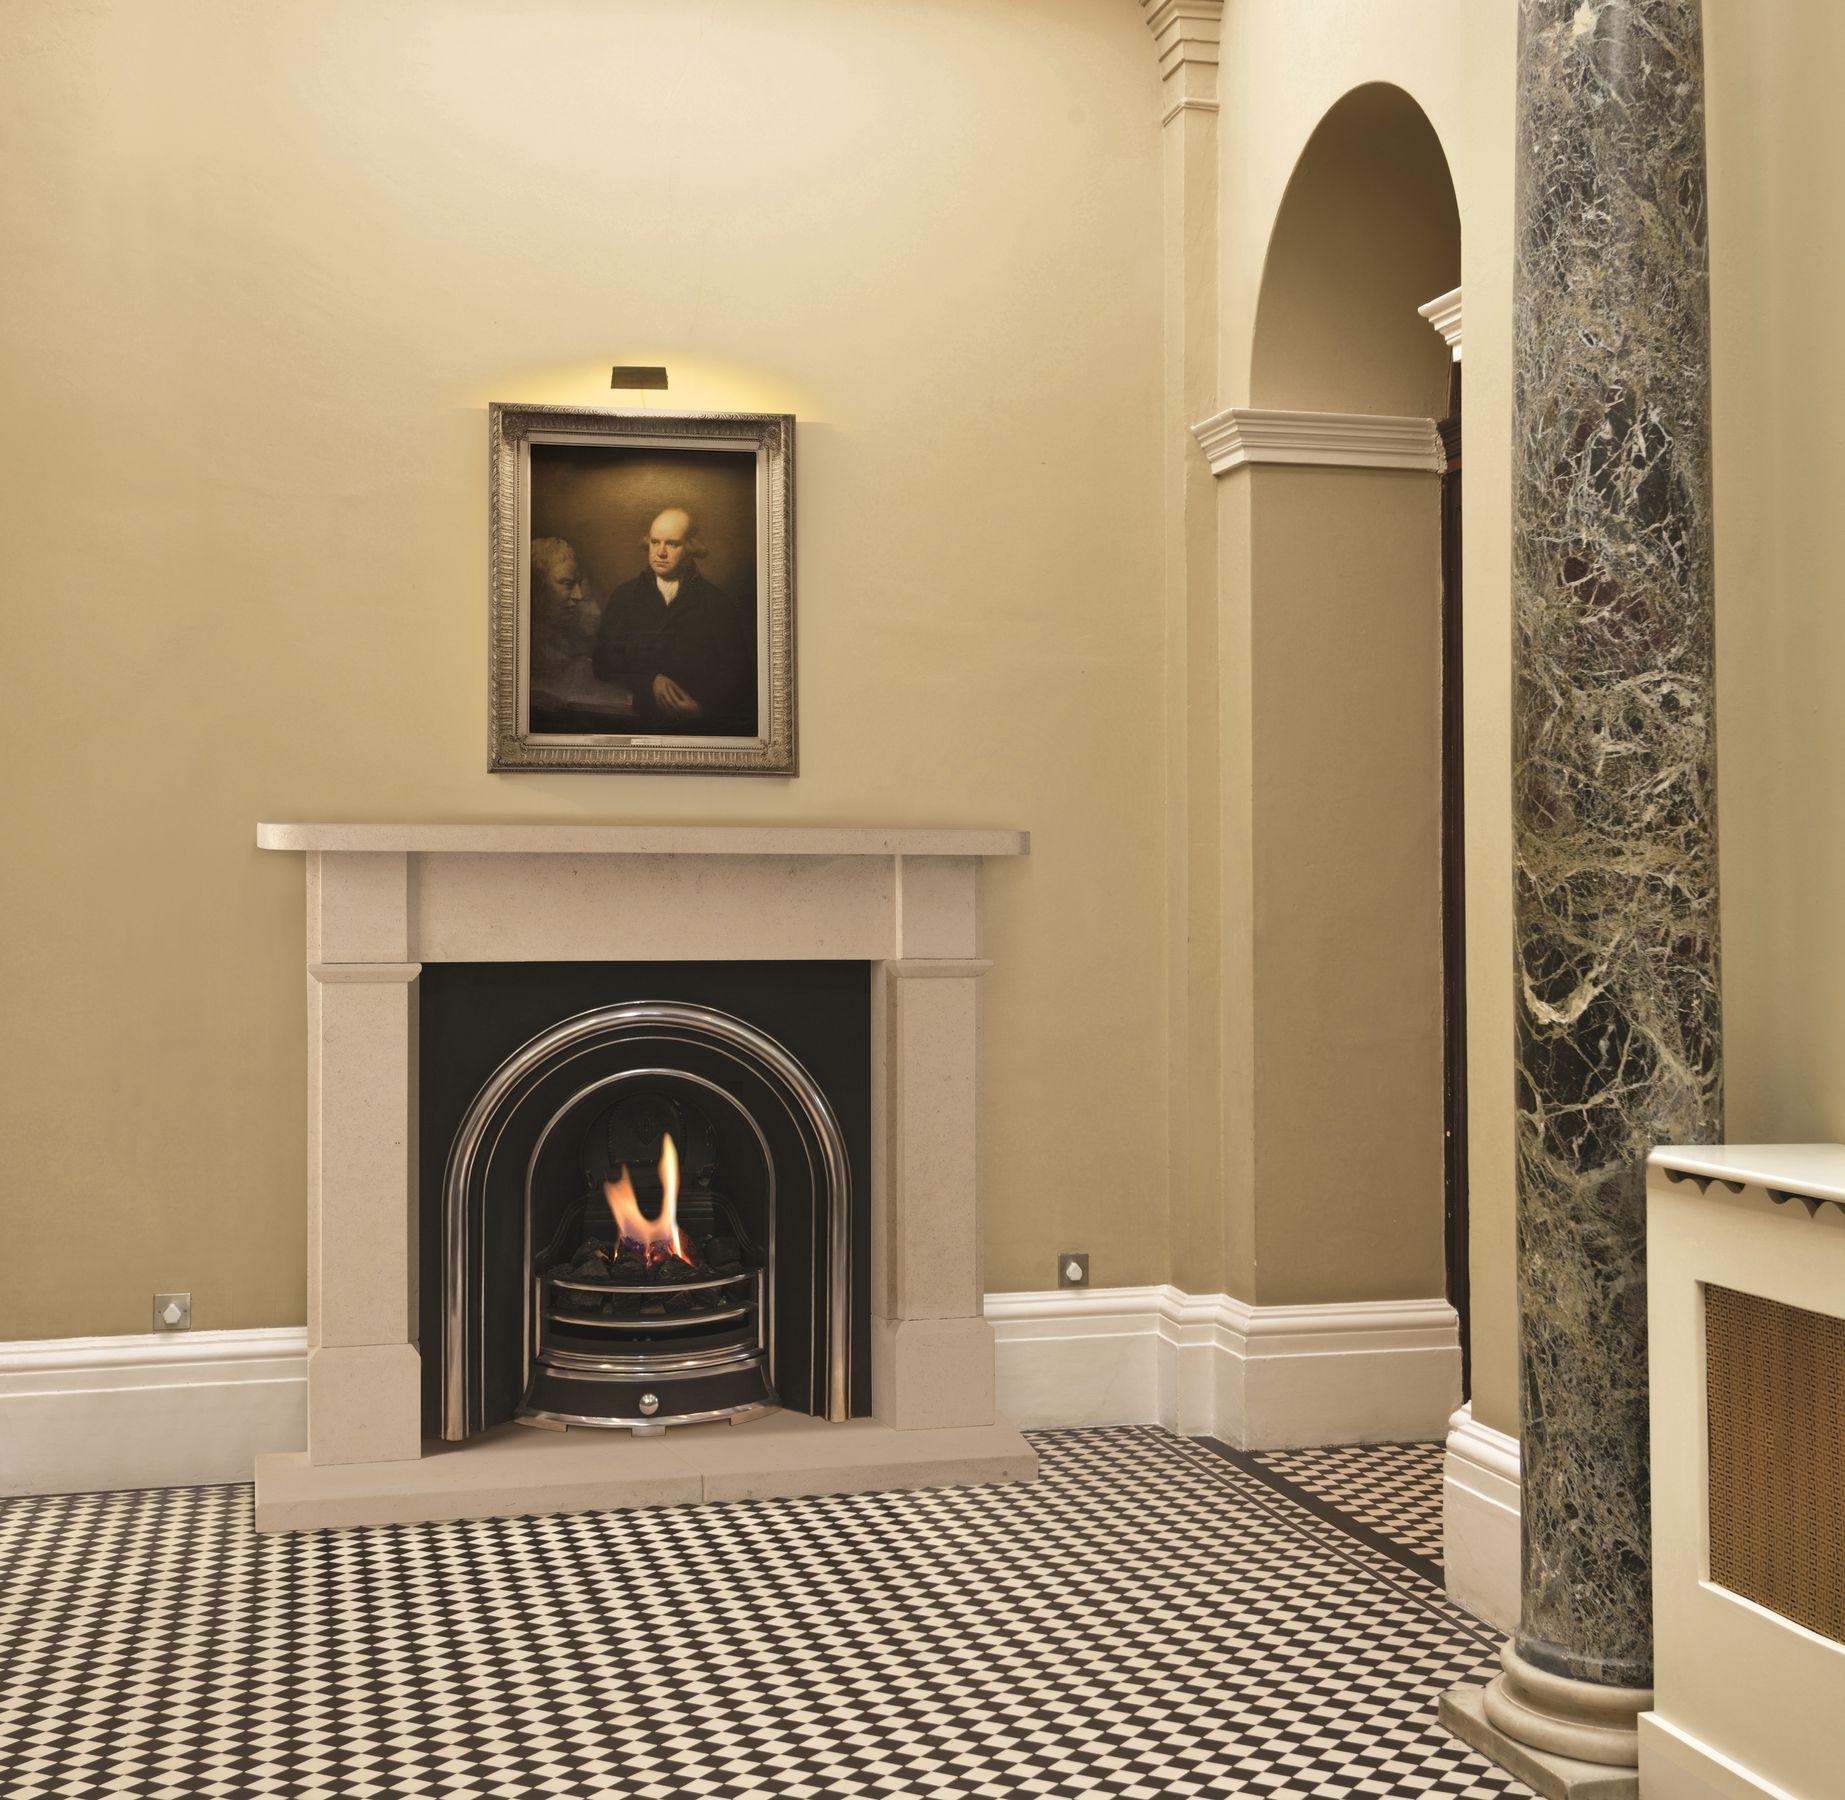 The Willsleigh Bathstone Fireplace